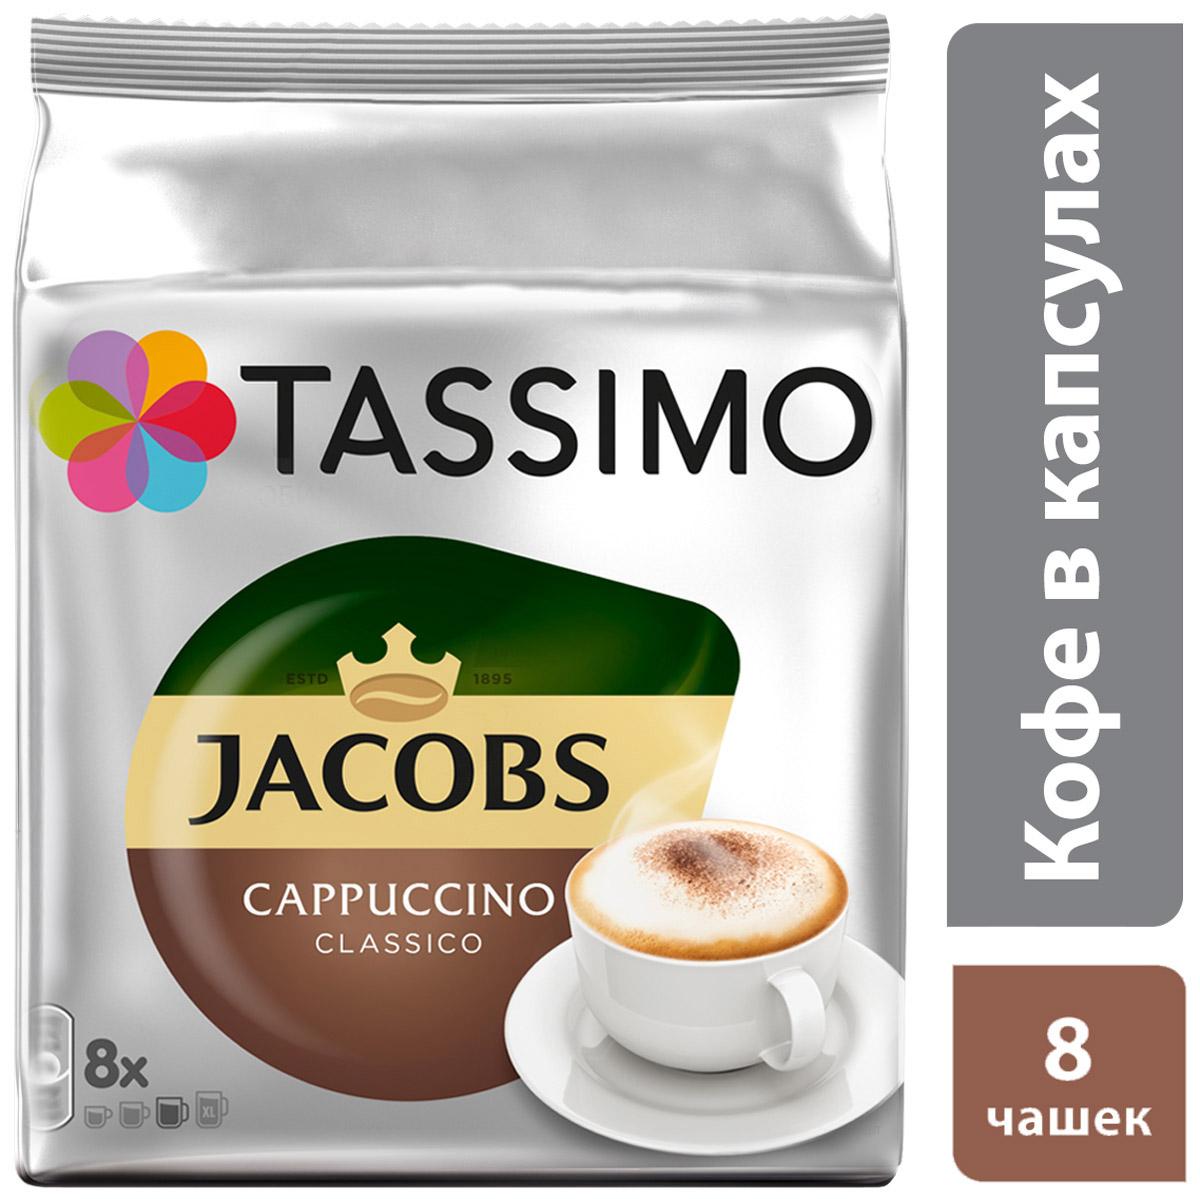 Tassimo Jacobs Cappuccino кофе в капсулах, 260 г кофе в капсулах tassimo карт нуар кафе лонг интенс 128г